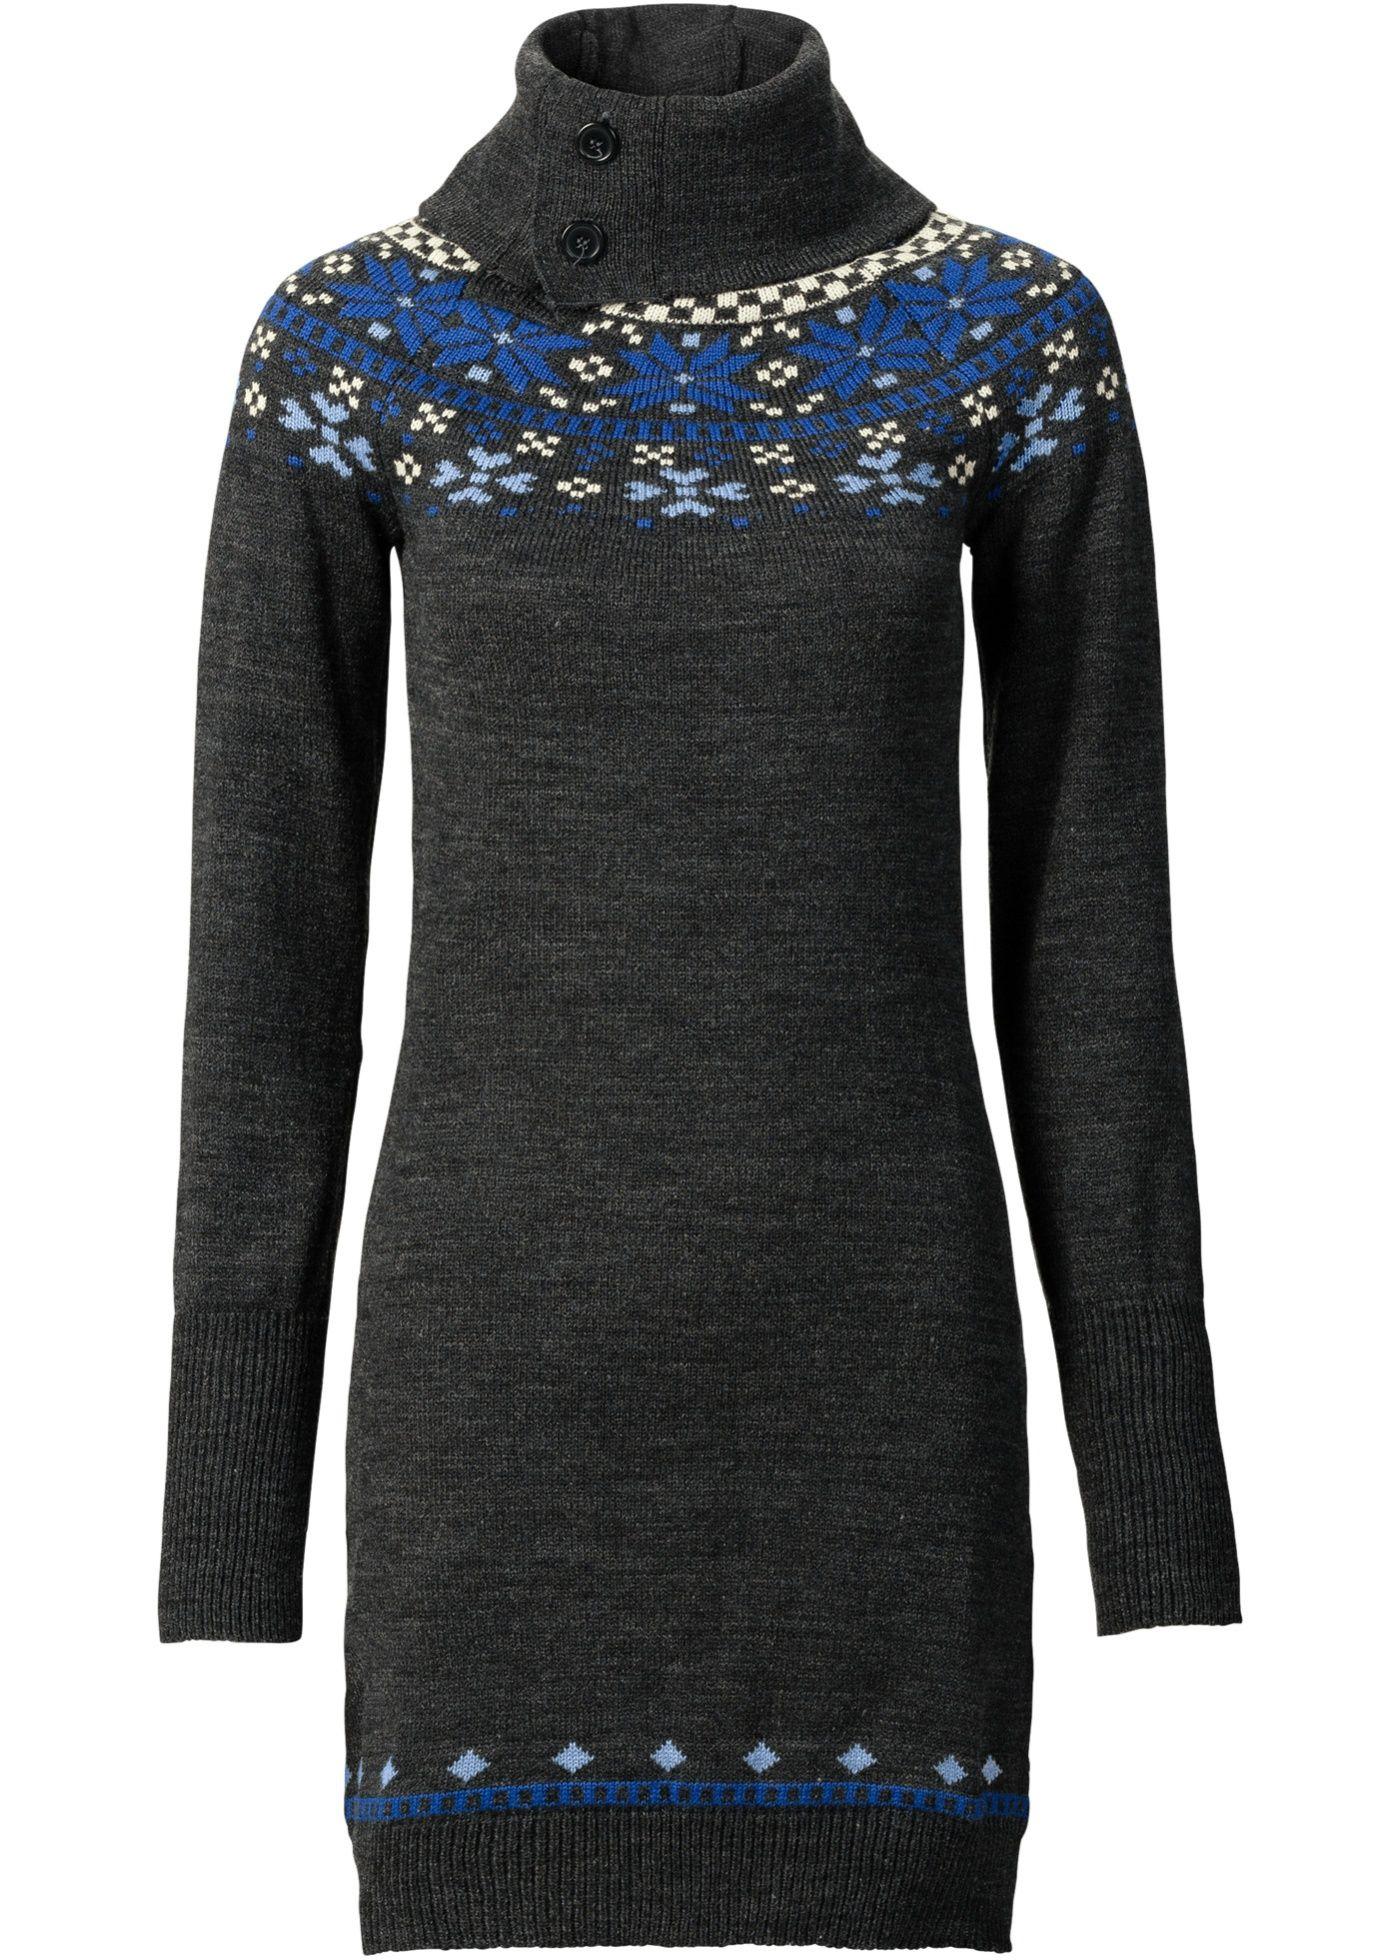 strickkleid | strickkleid, graues strickkleid und kleider